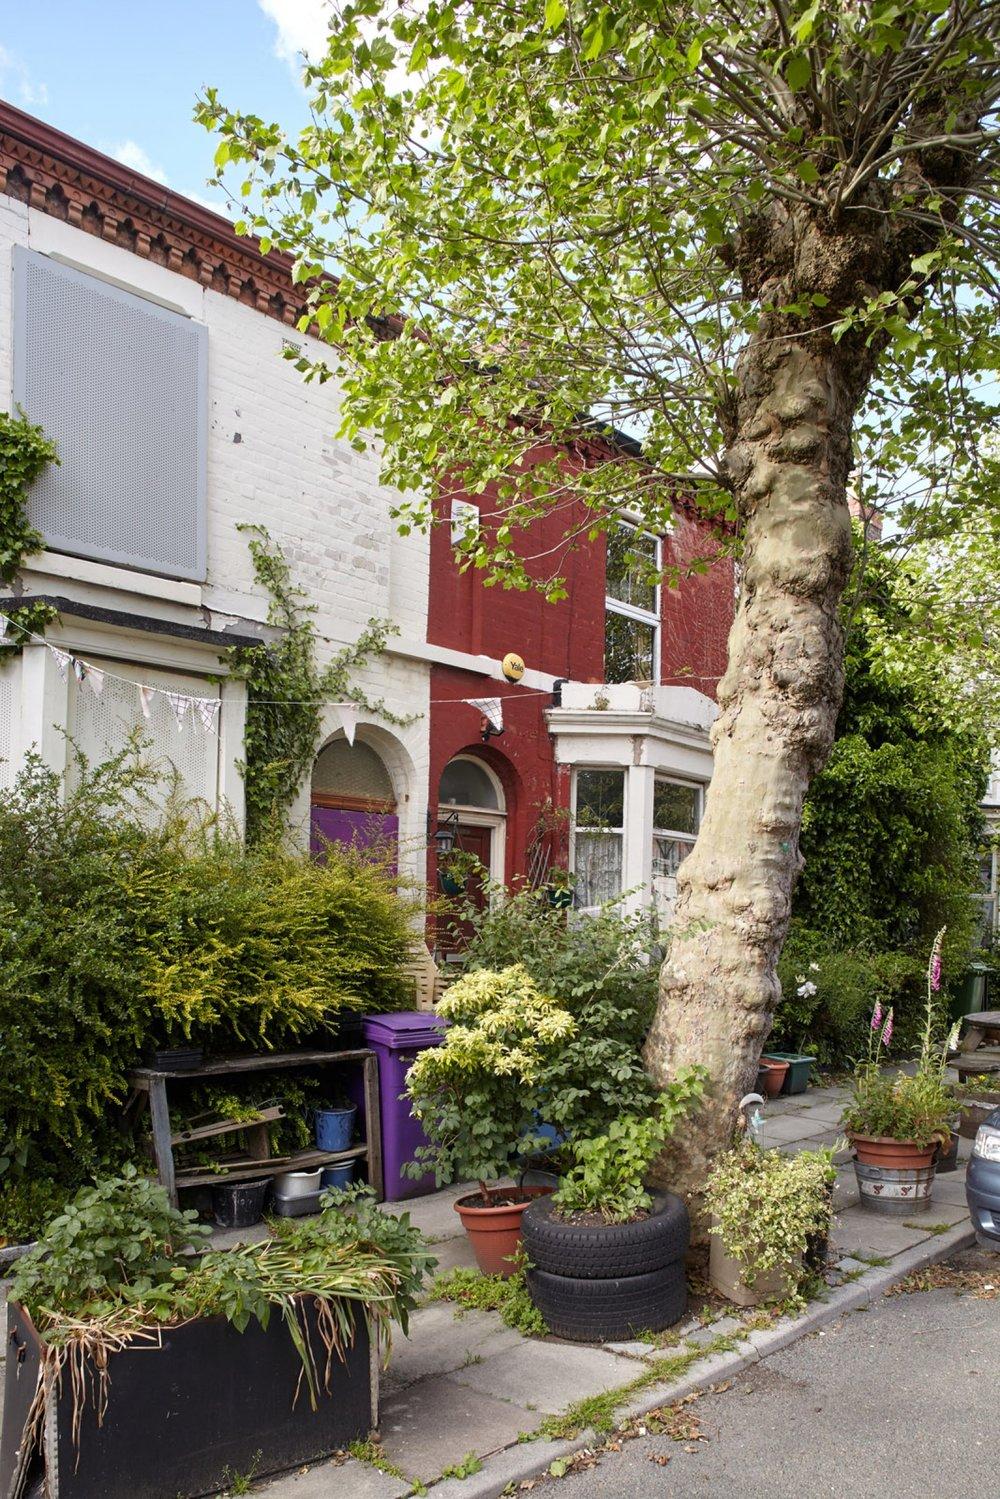 Granby Four Streets (2013-17) © Assemble